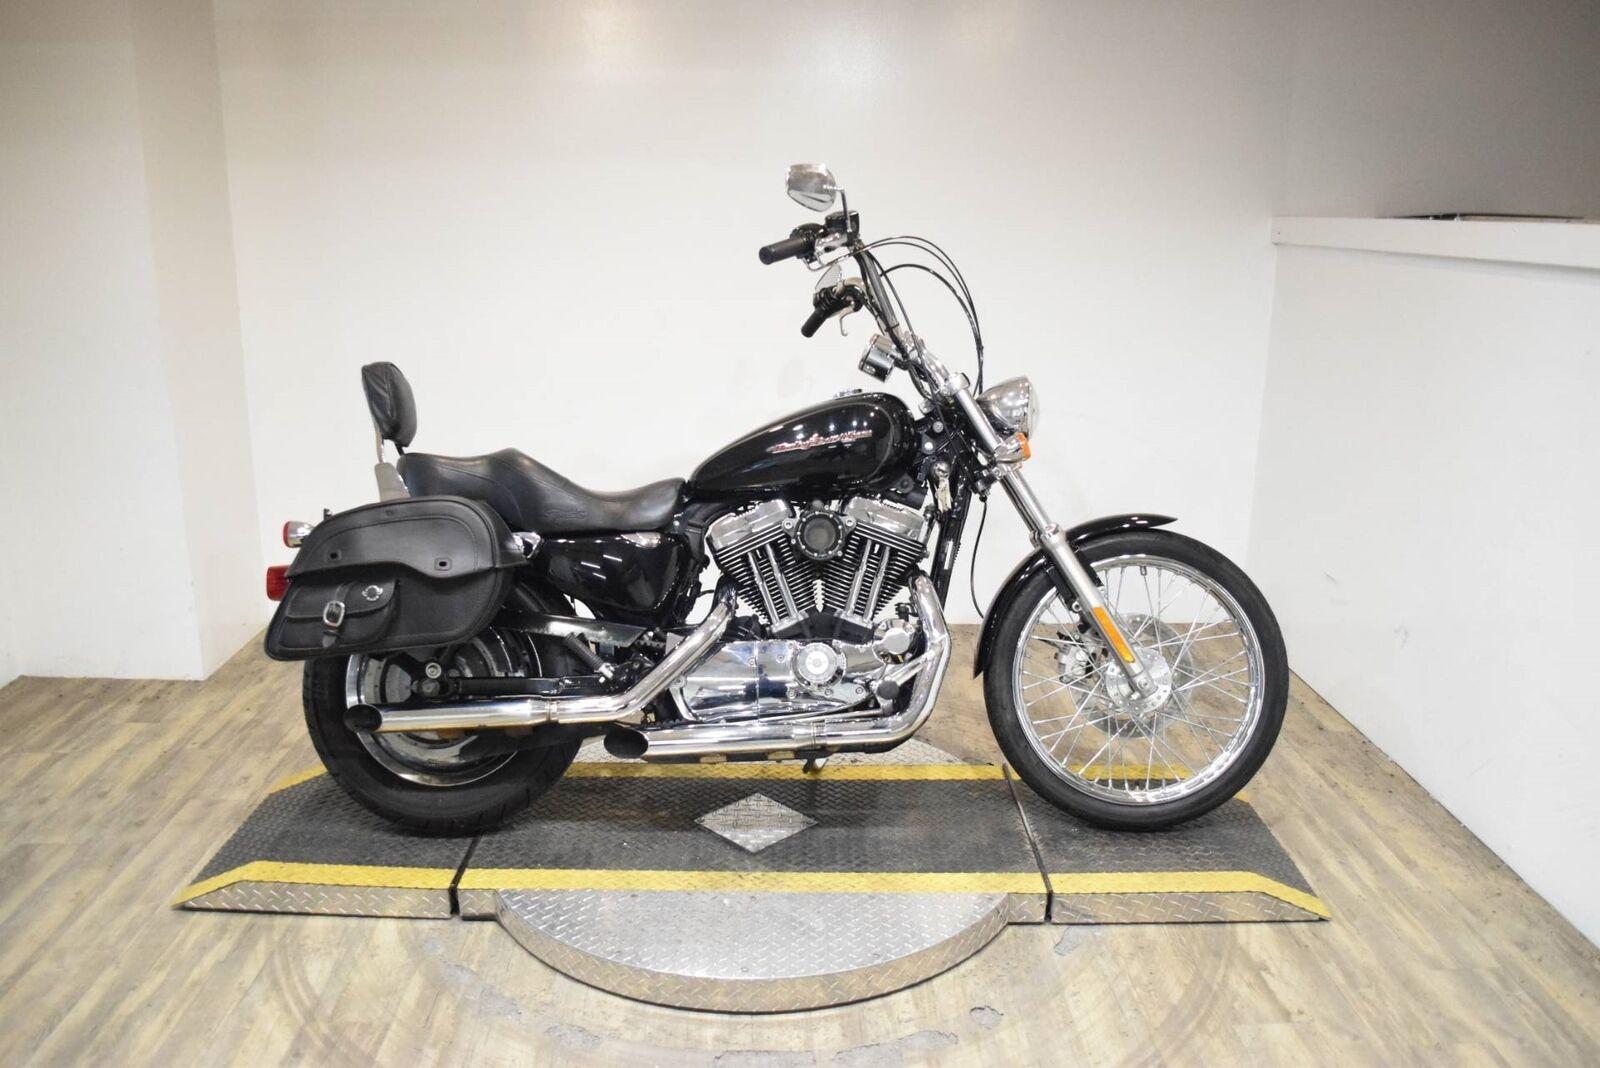 2007 Harley Davidson Sportster Ebay